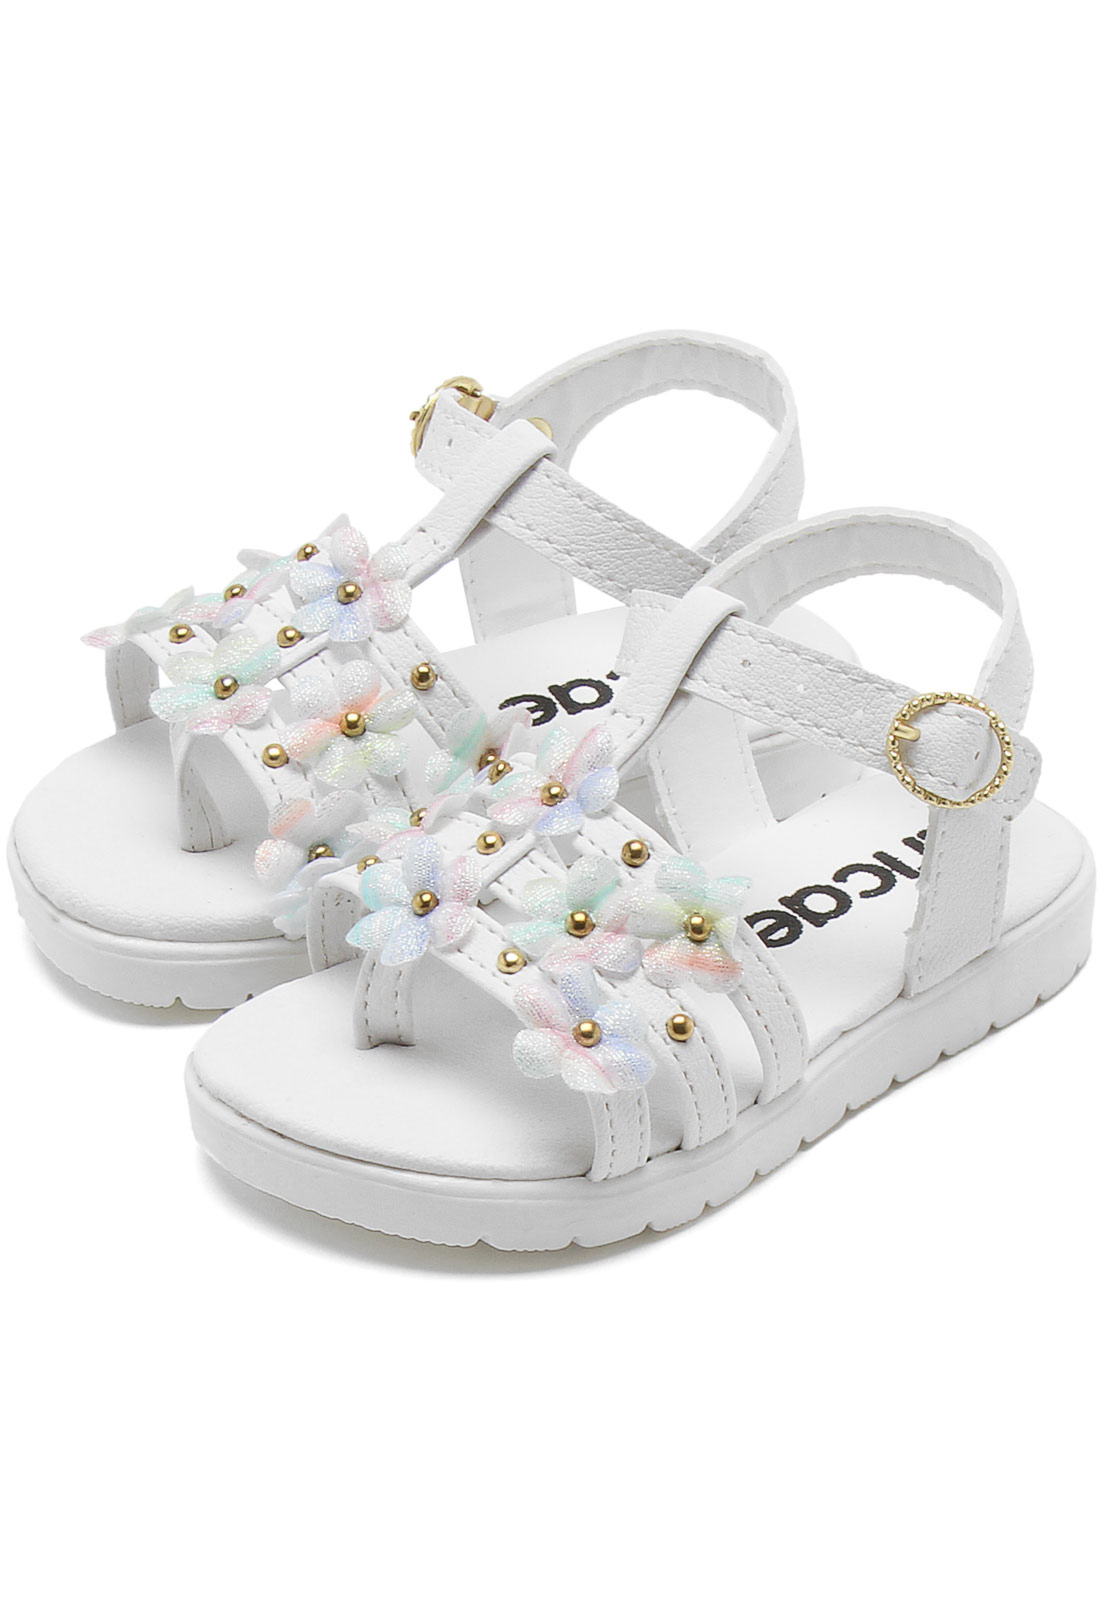 Tênis Tricae Menina Coração Branco   Sapatos menina